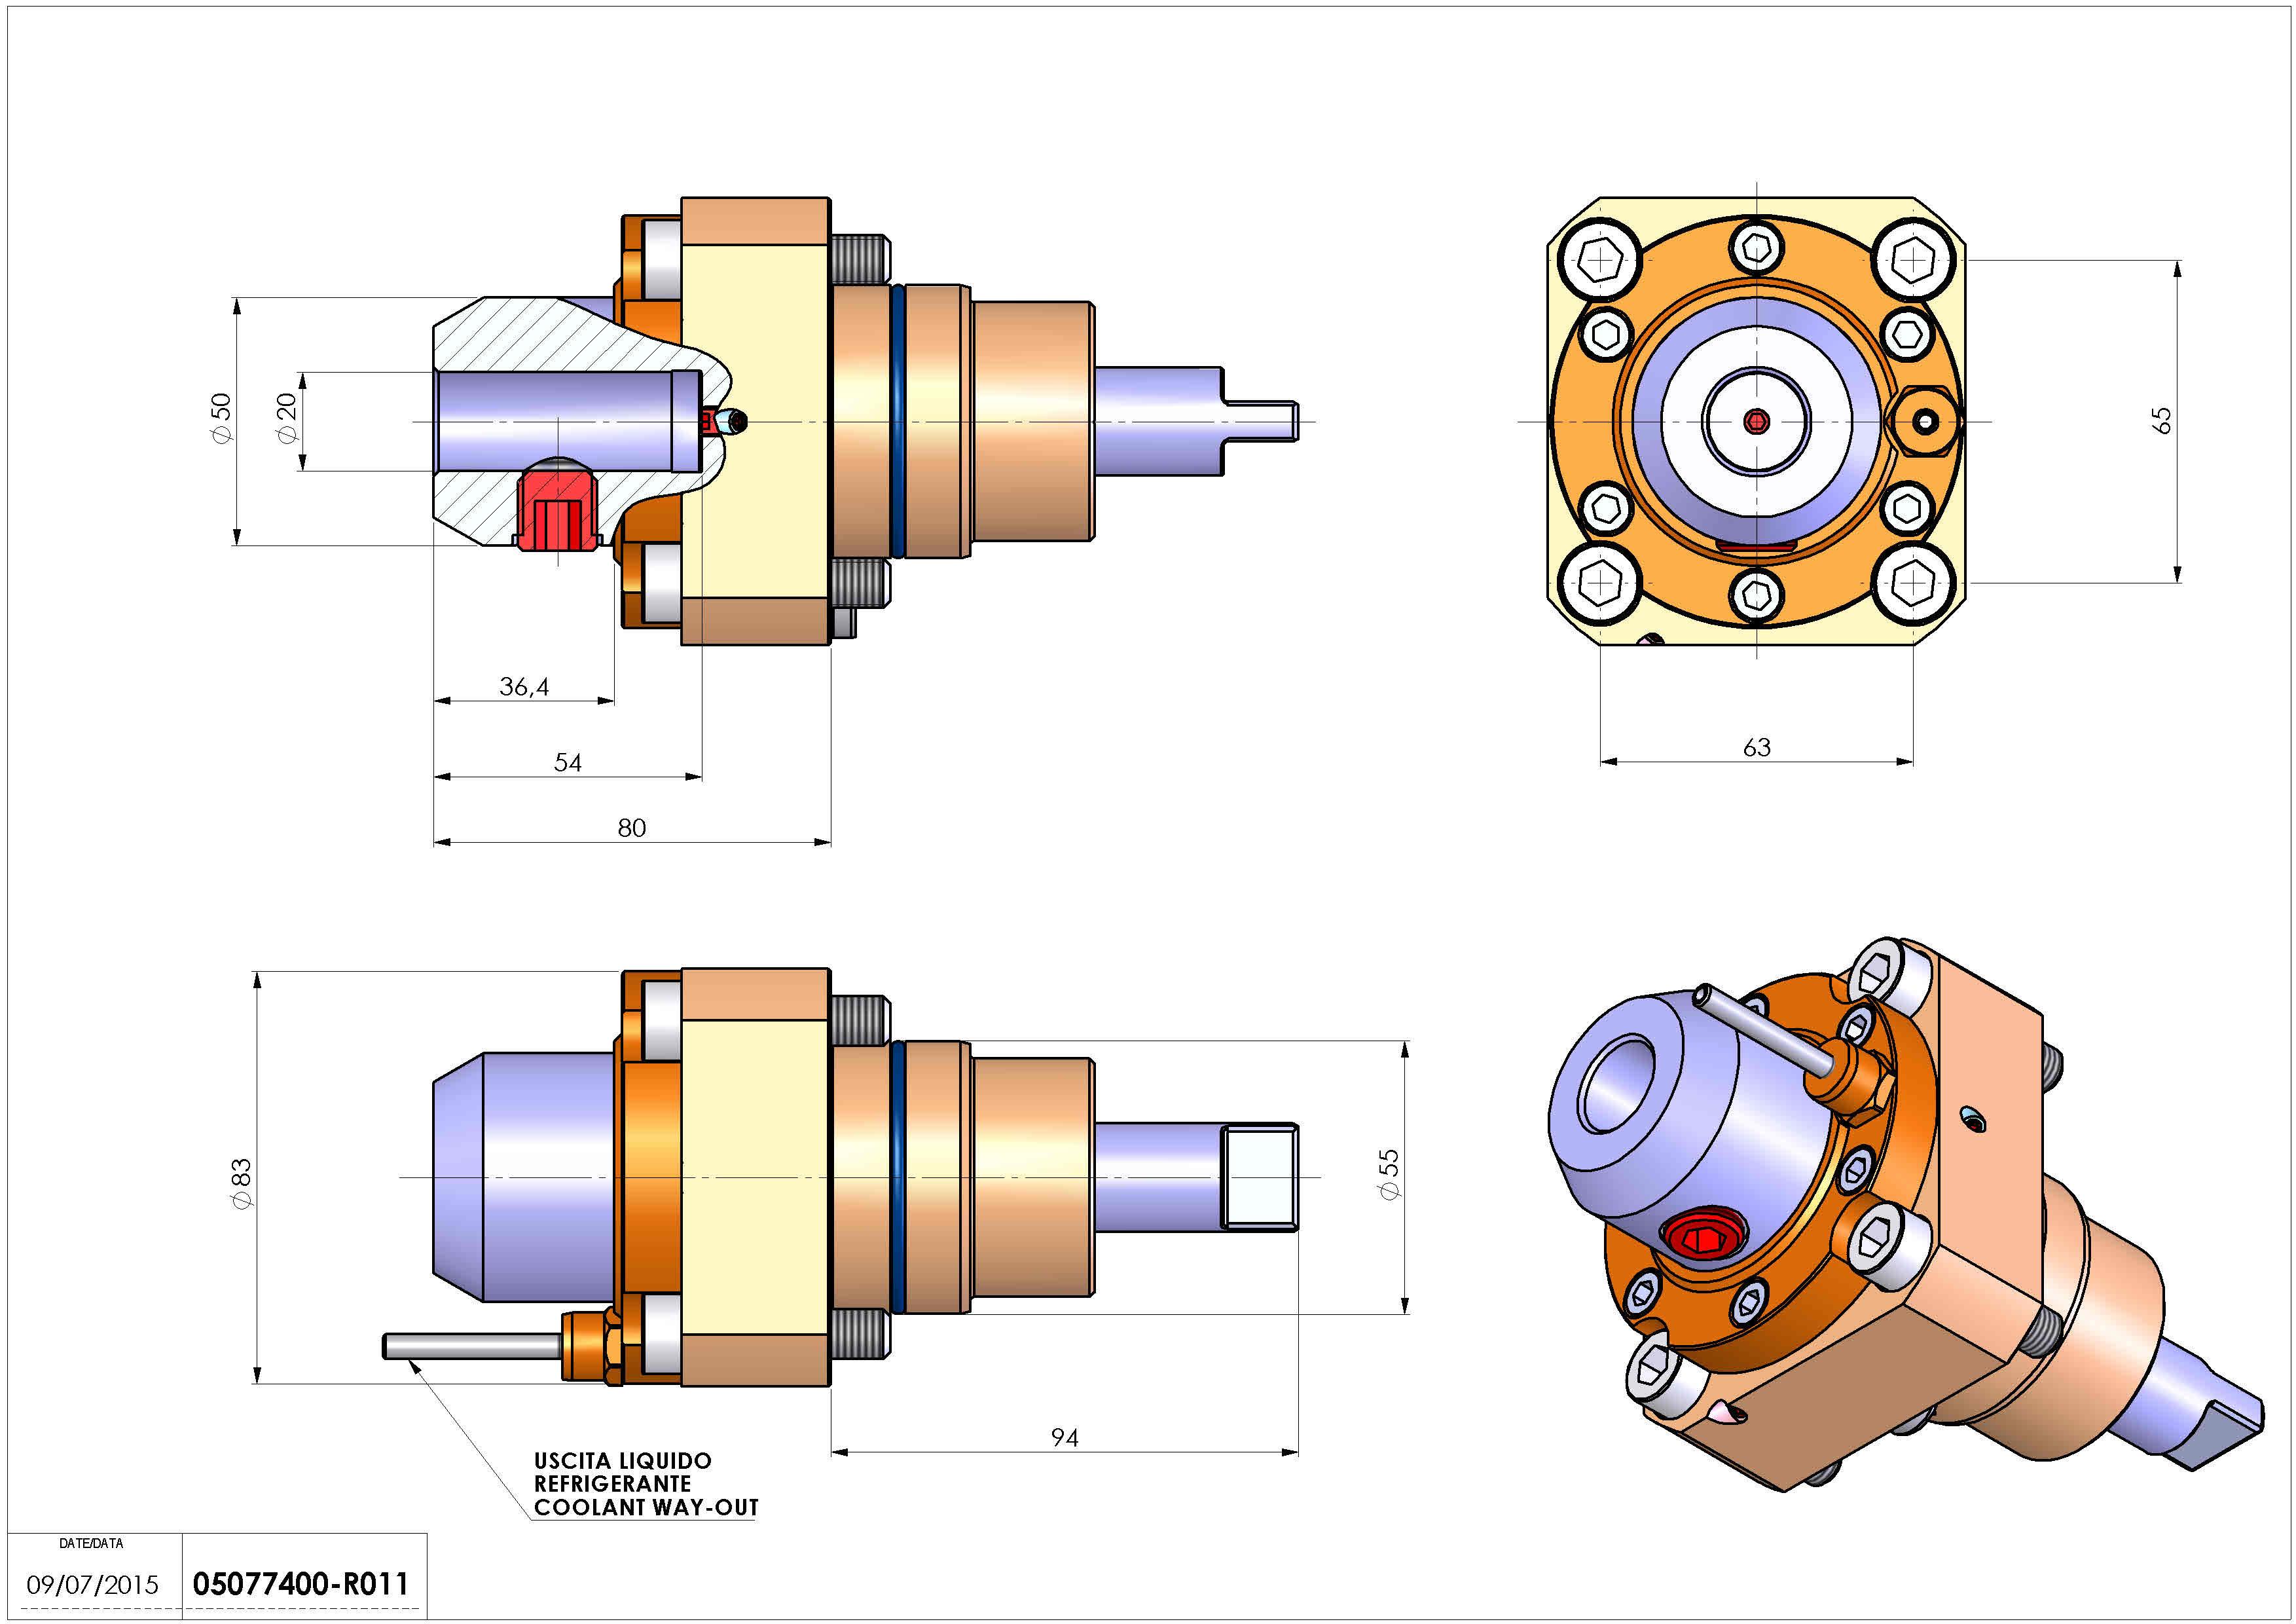 Technical image - LT-S D55 WELDON-20 H80.